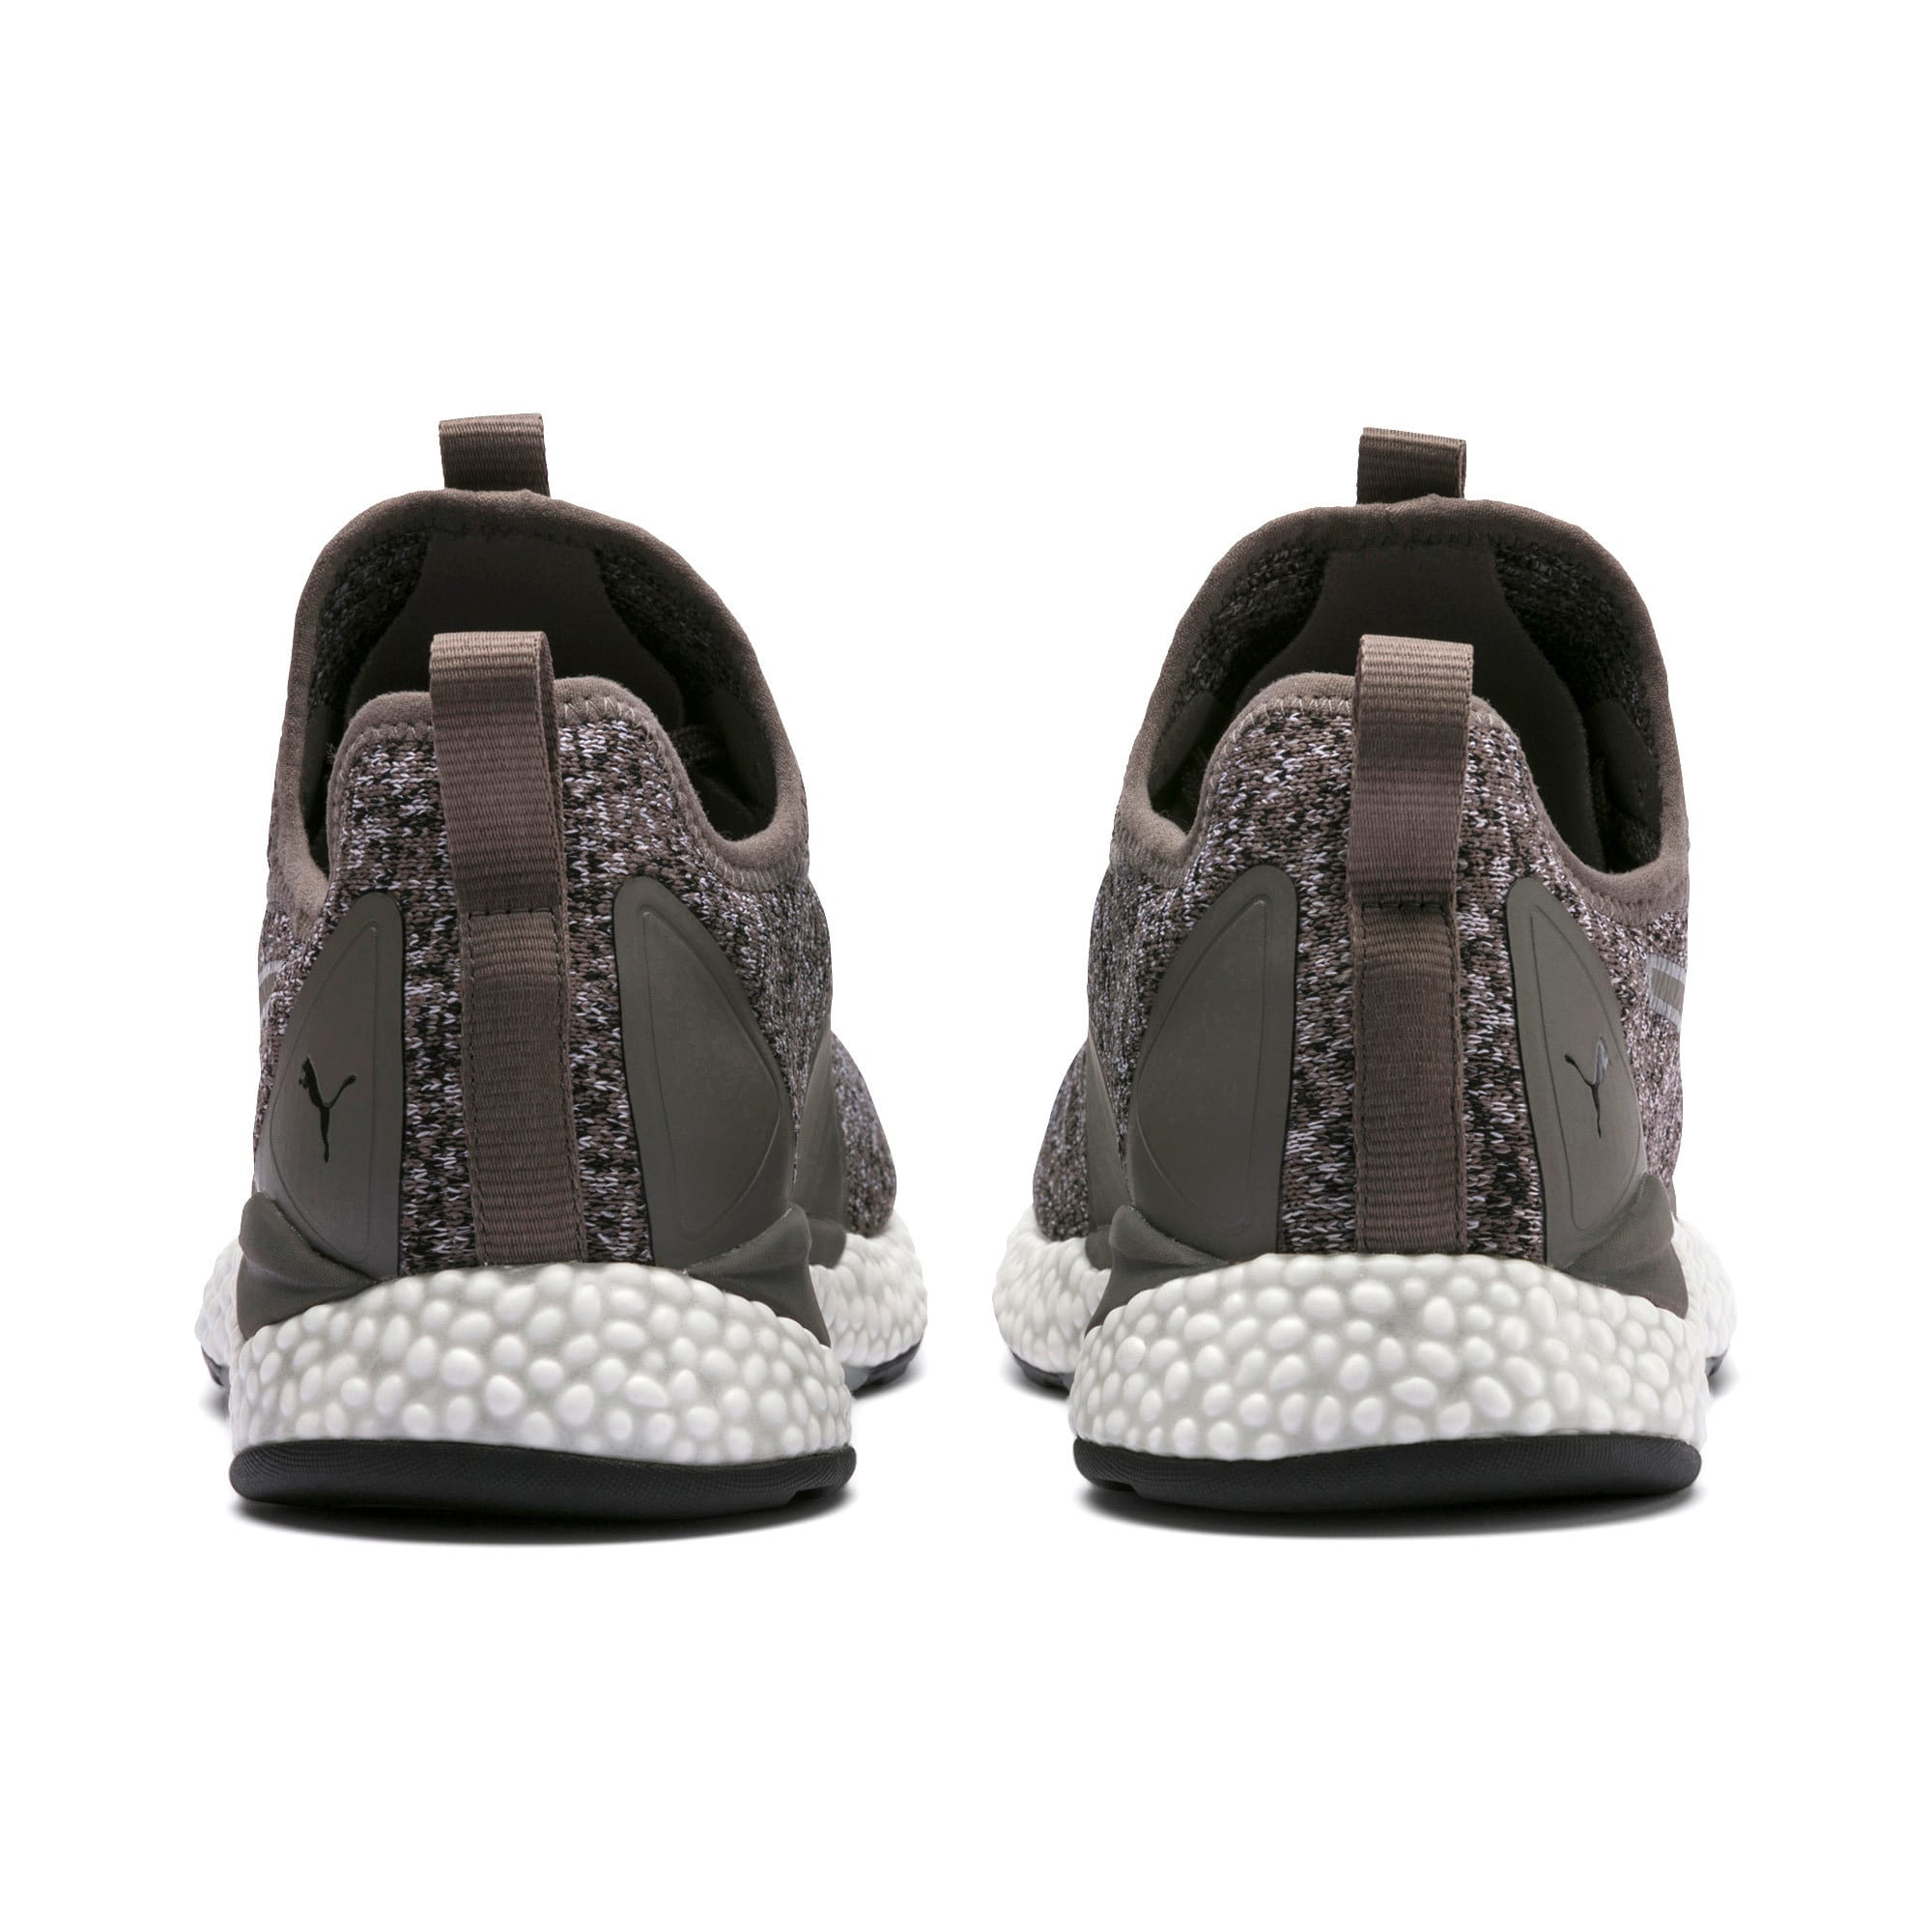 Thumbnail 4 of Hybrid Runner Men's Running Shoes, Charcoal Gray-Puma White, medium-IND